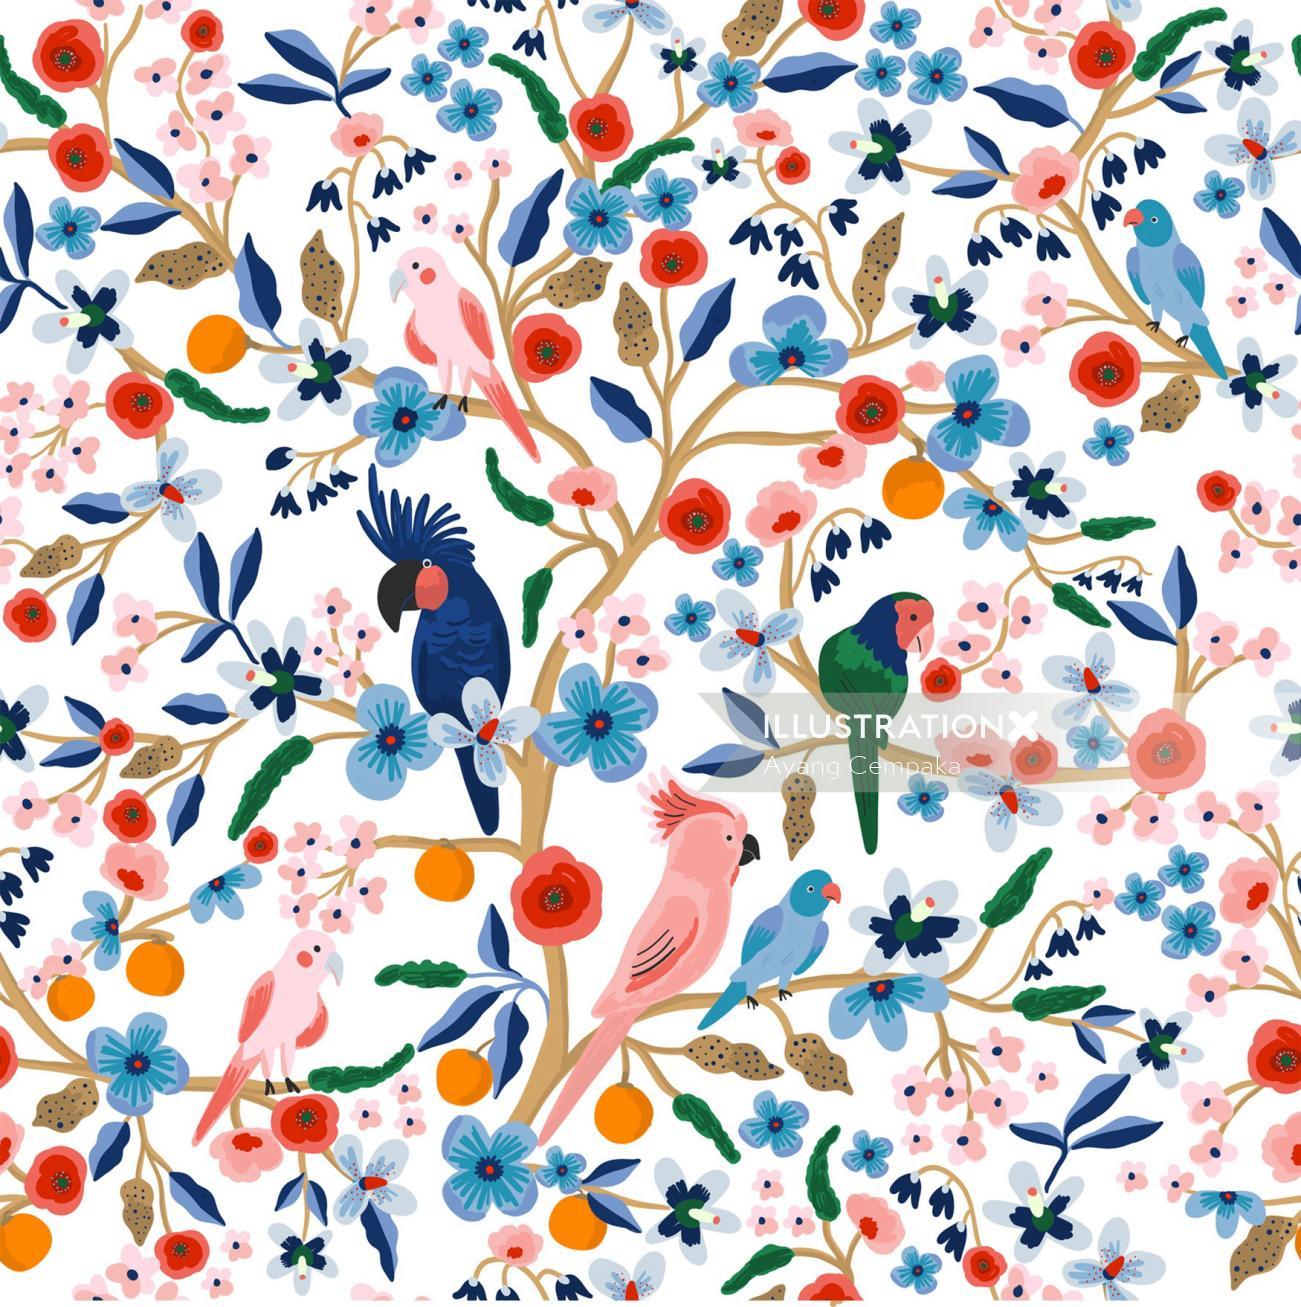 Animals birds in tree